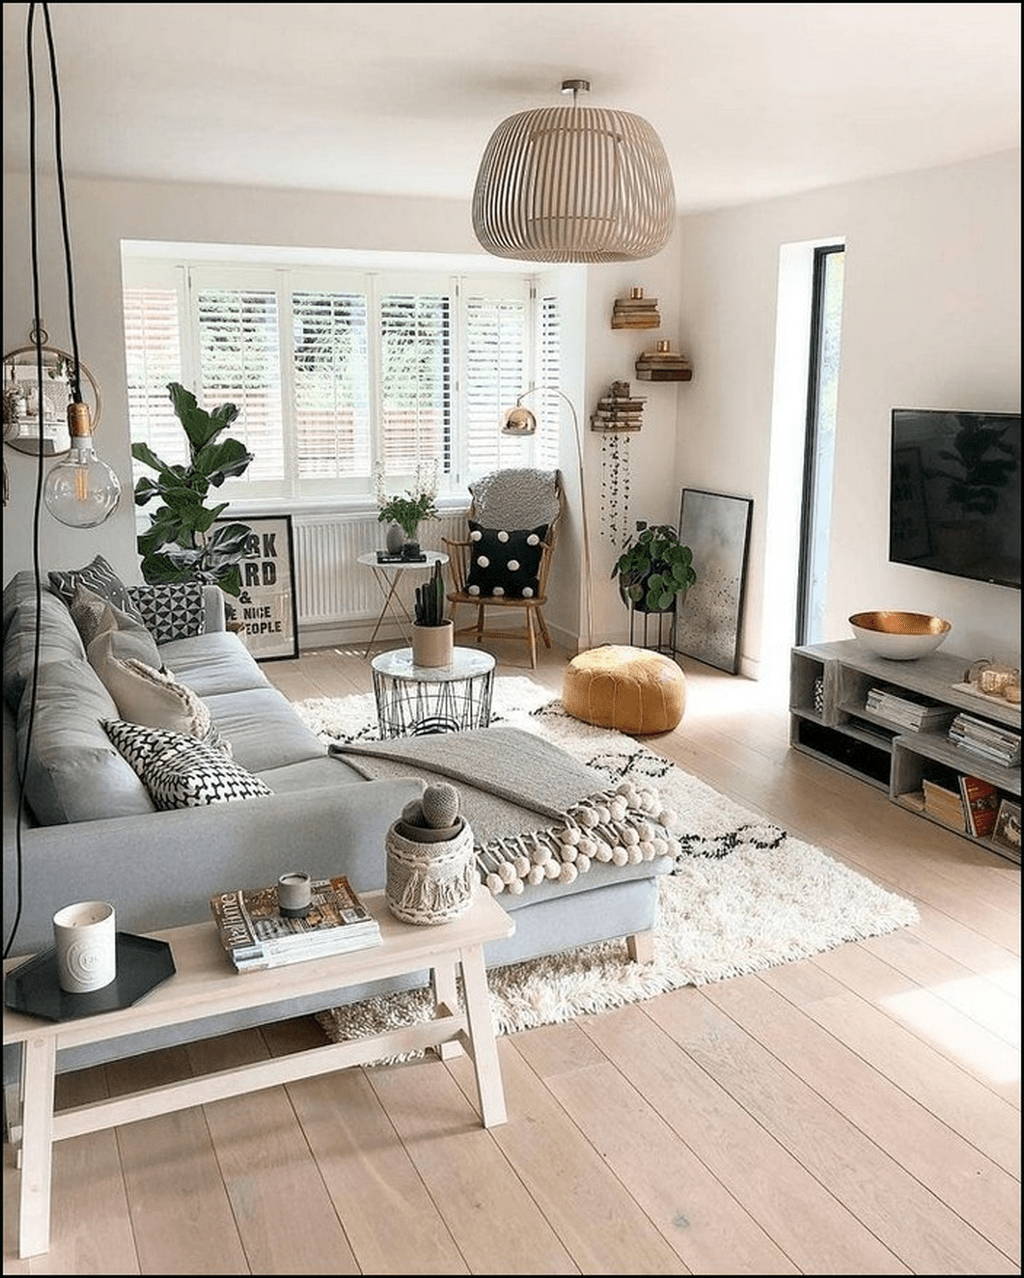 Inspiring Modern Apartment Living Room Decoration Ideas 25 In 2020 Living Room Scandinavian Living Room Decor Apartment Farmhouse Style Living Room